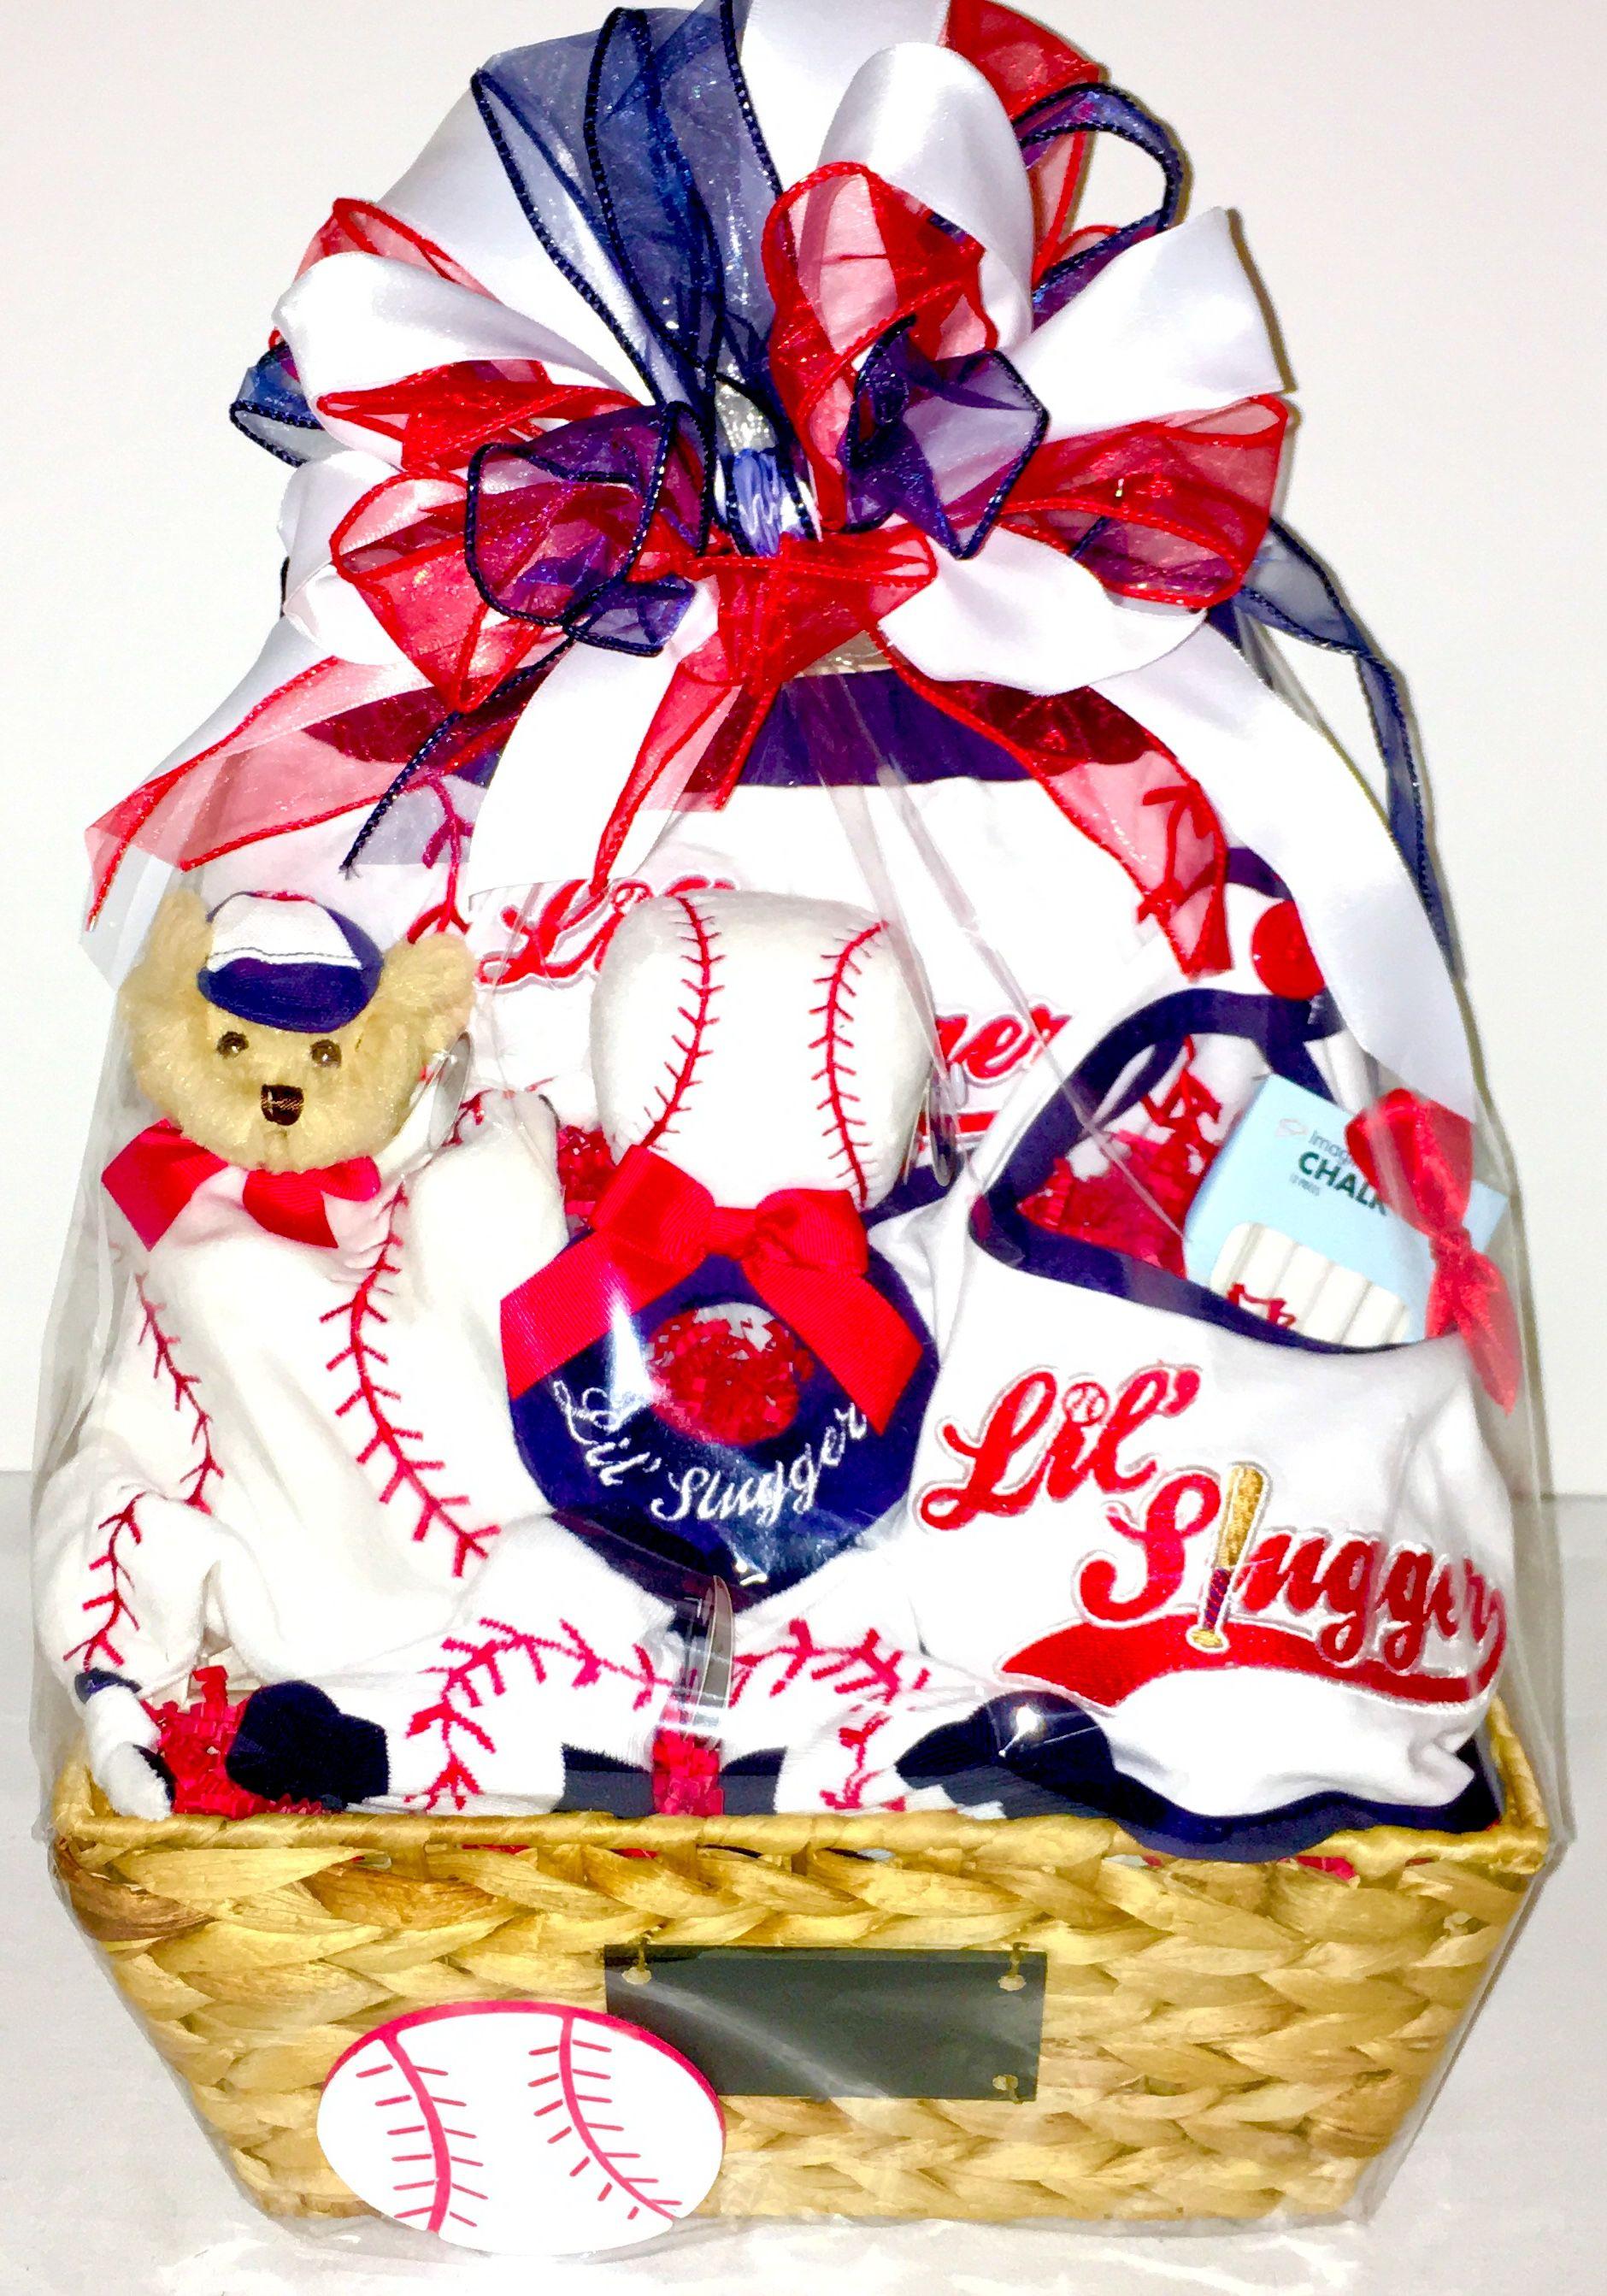 DIY Baseball gift basket | Baseball gift basket, Baseball ...  |Baseball Sympathy Gifts